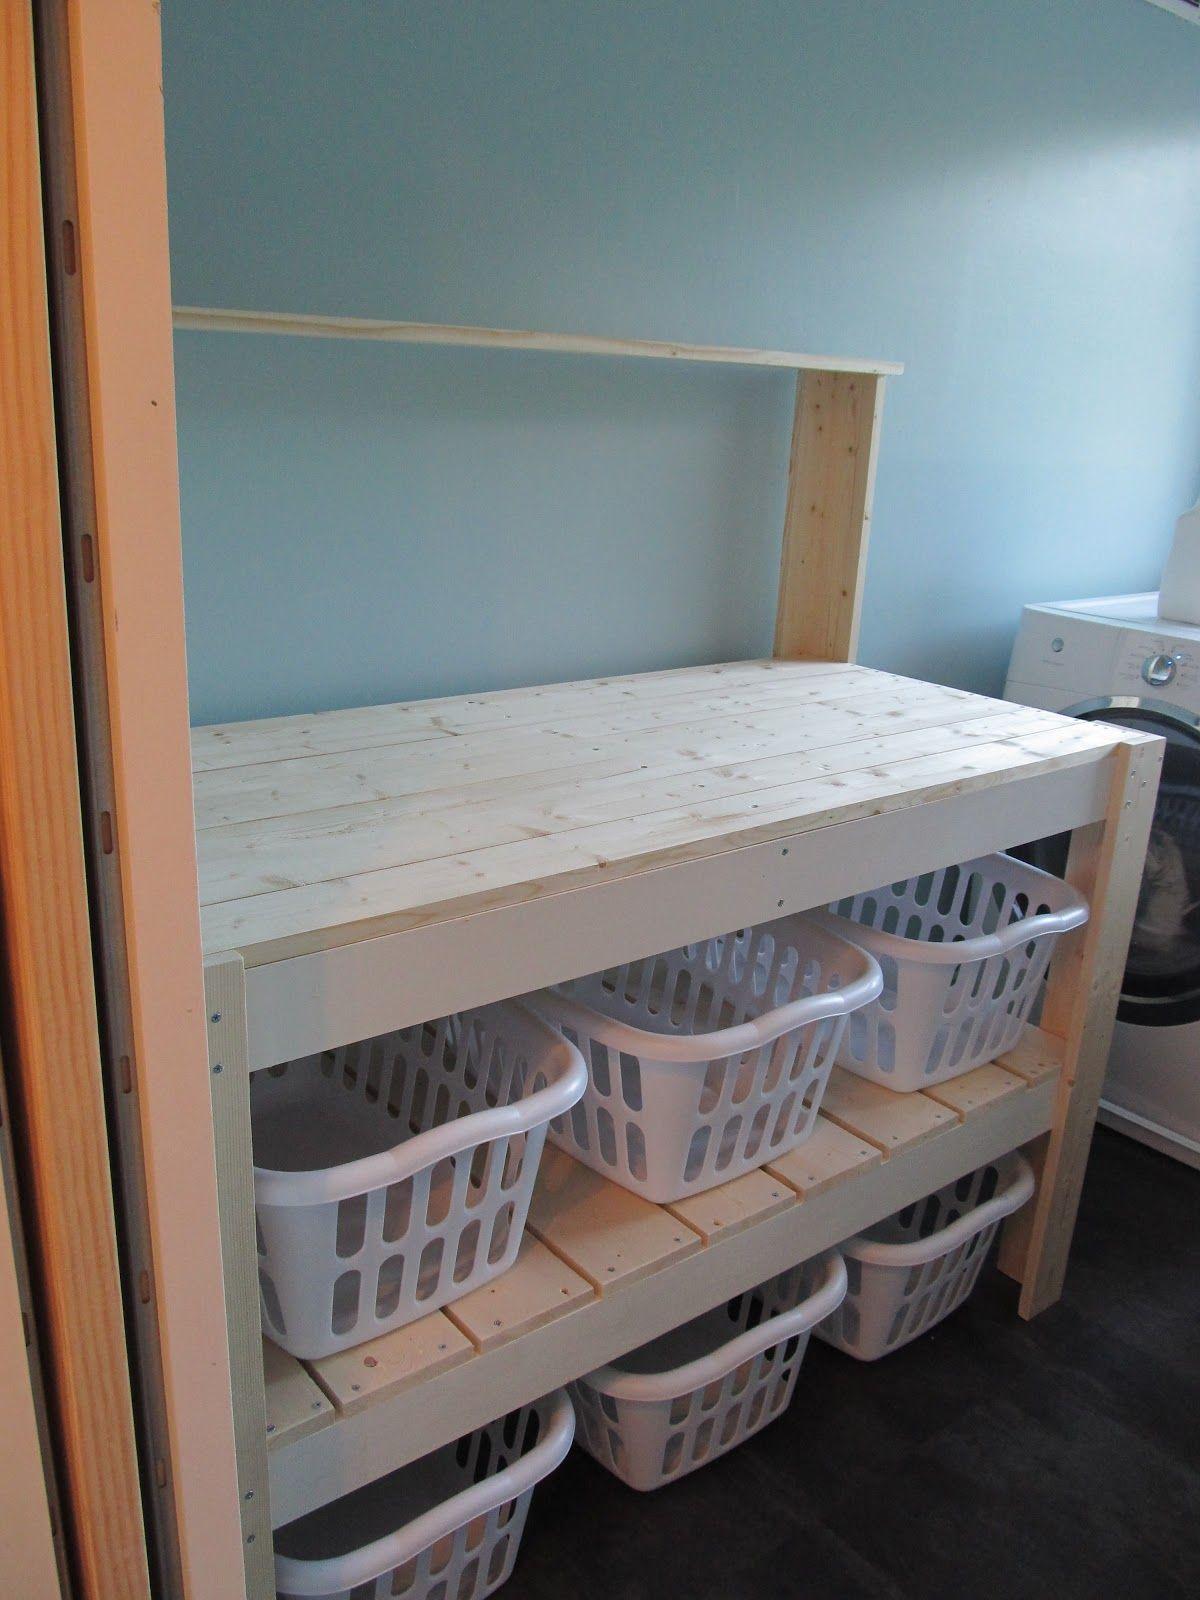 Potting Bench Laundry Sorter Laundry room layouts